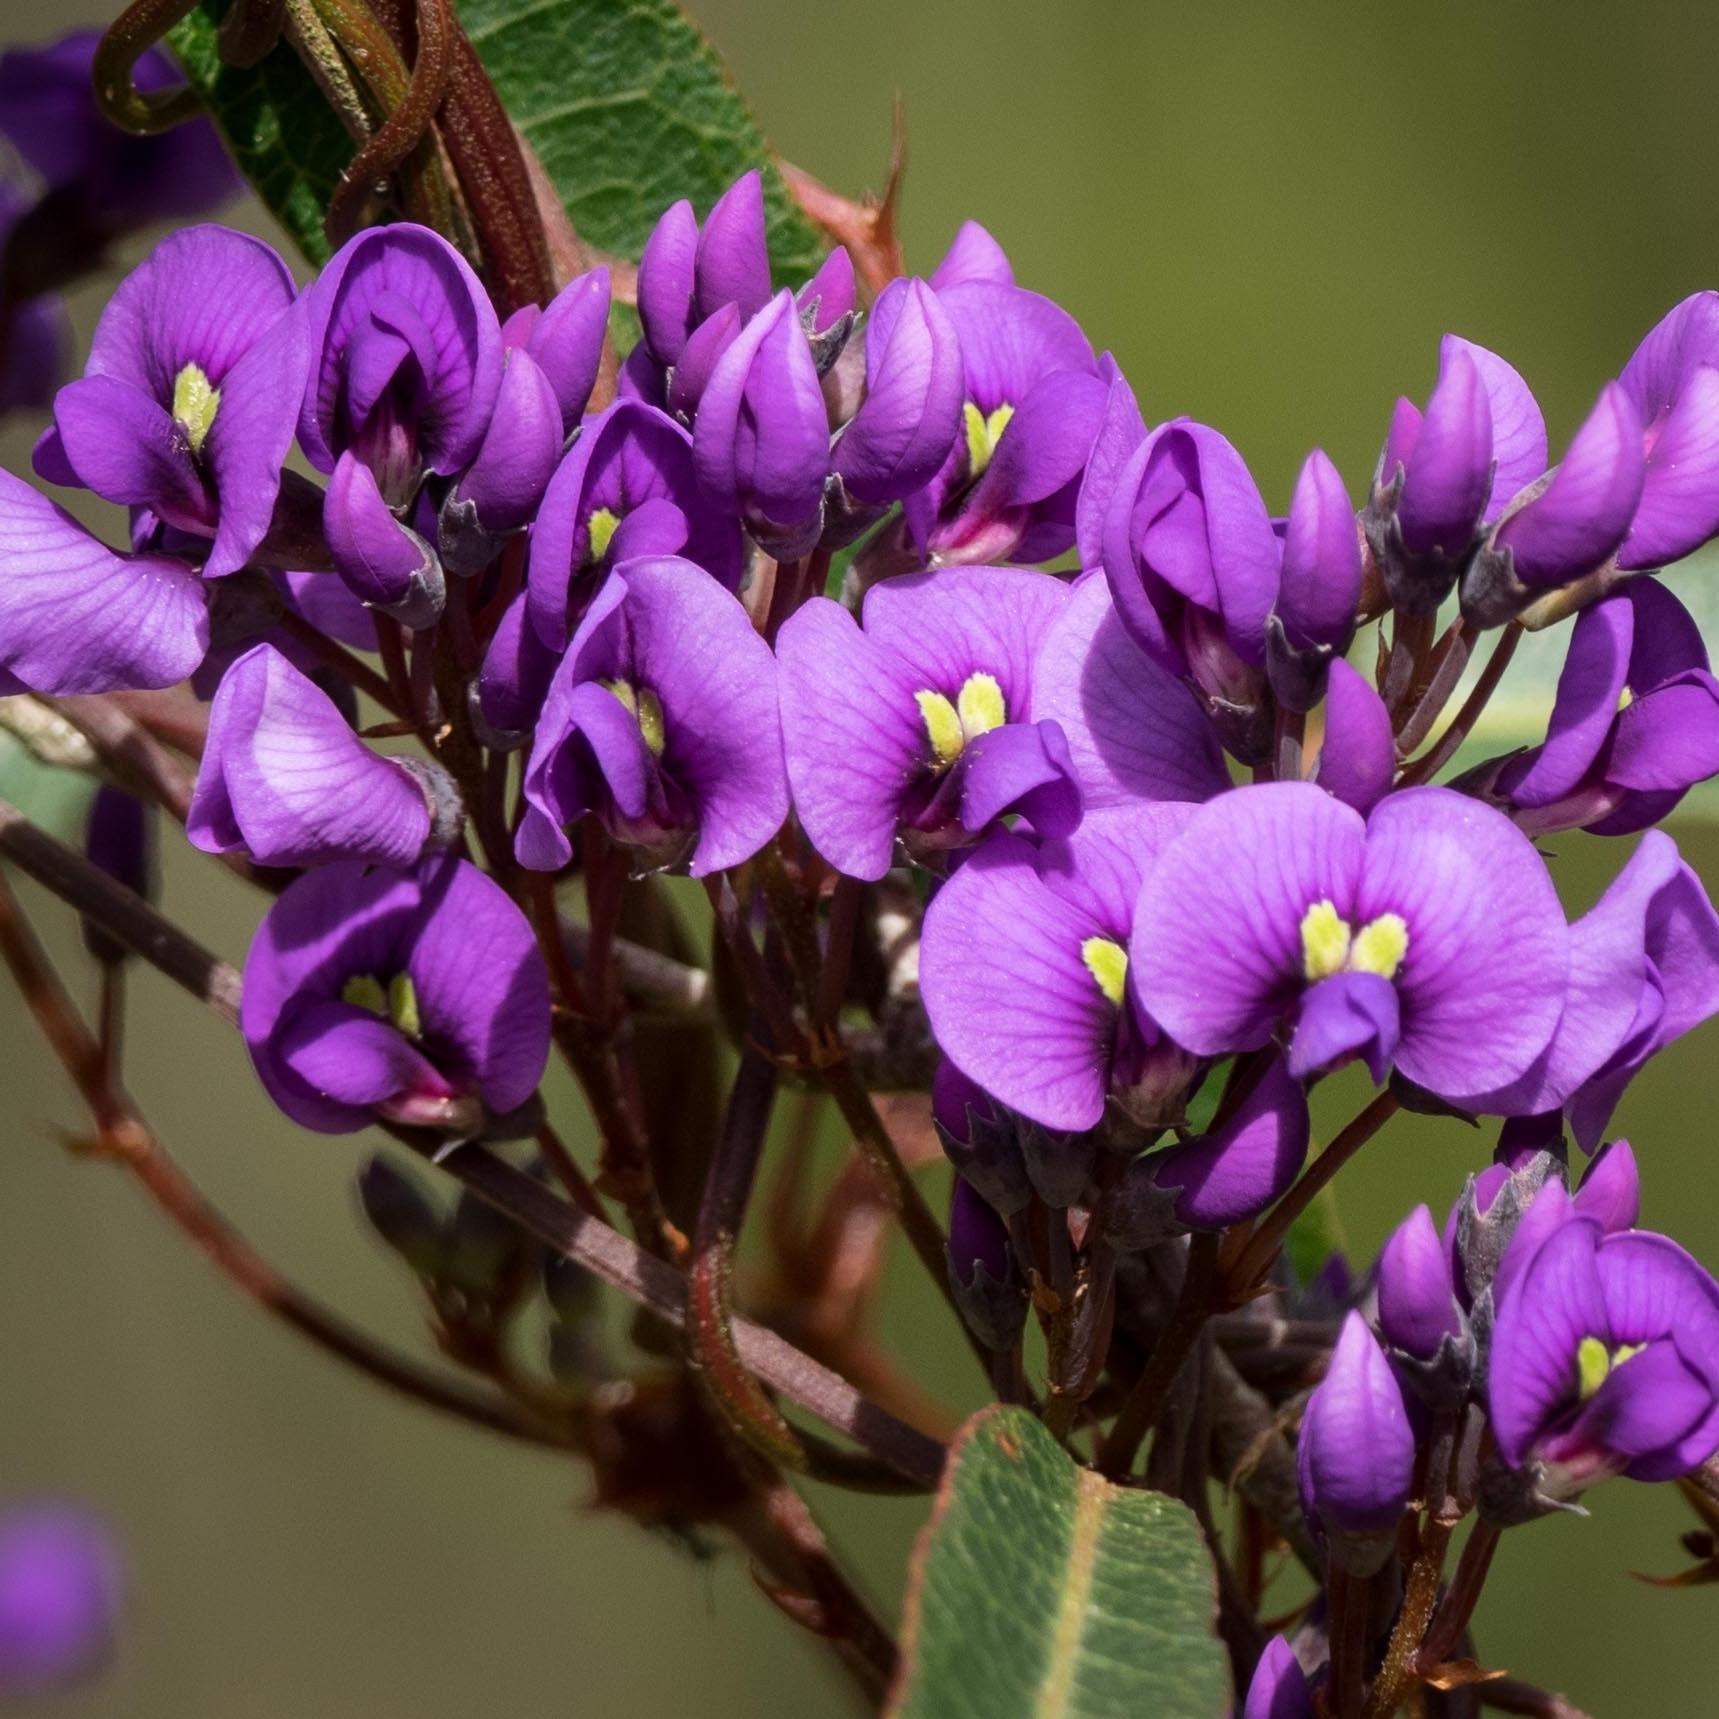 identifyingplants - flowering plants